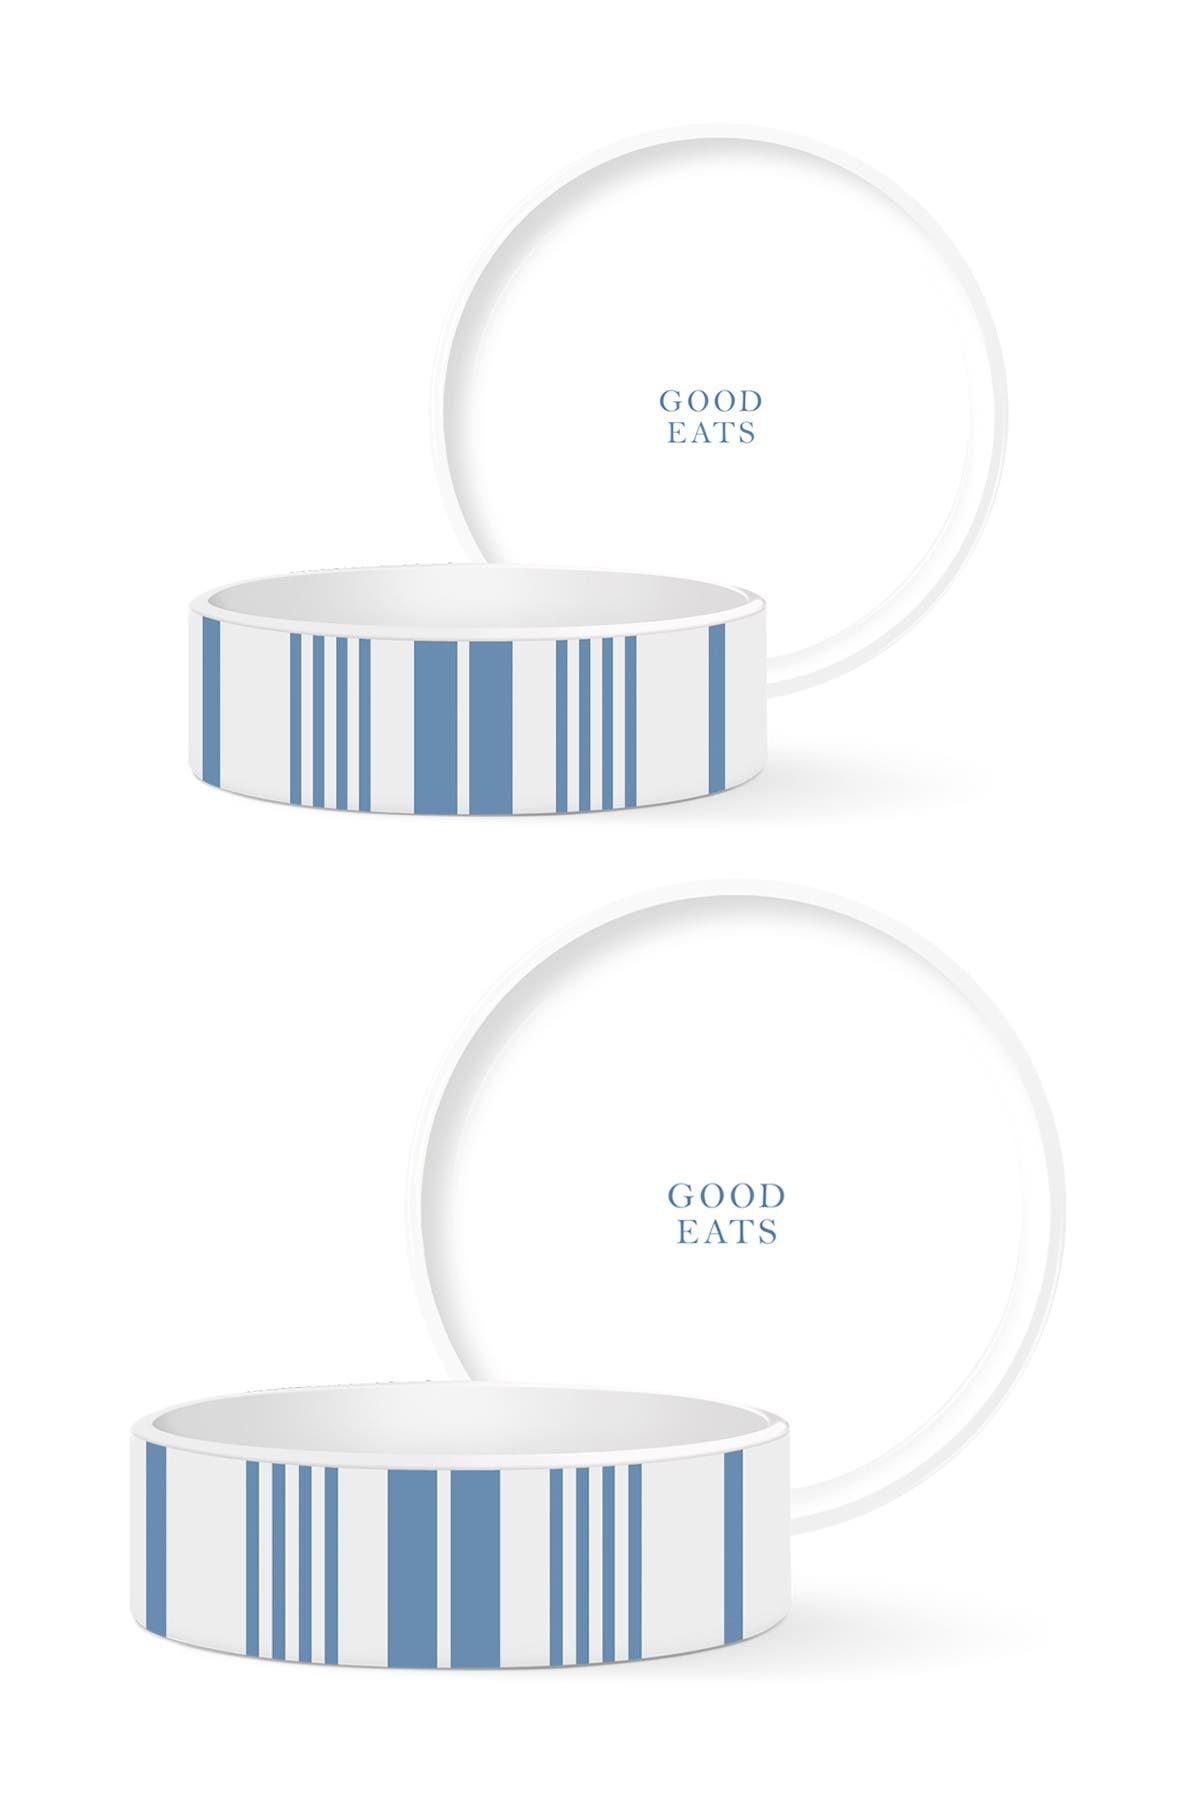 Image of Fringe Studio Good Eats Small & Medium Pet Bowls 2-Piece Set